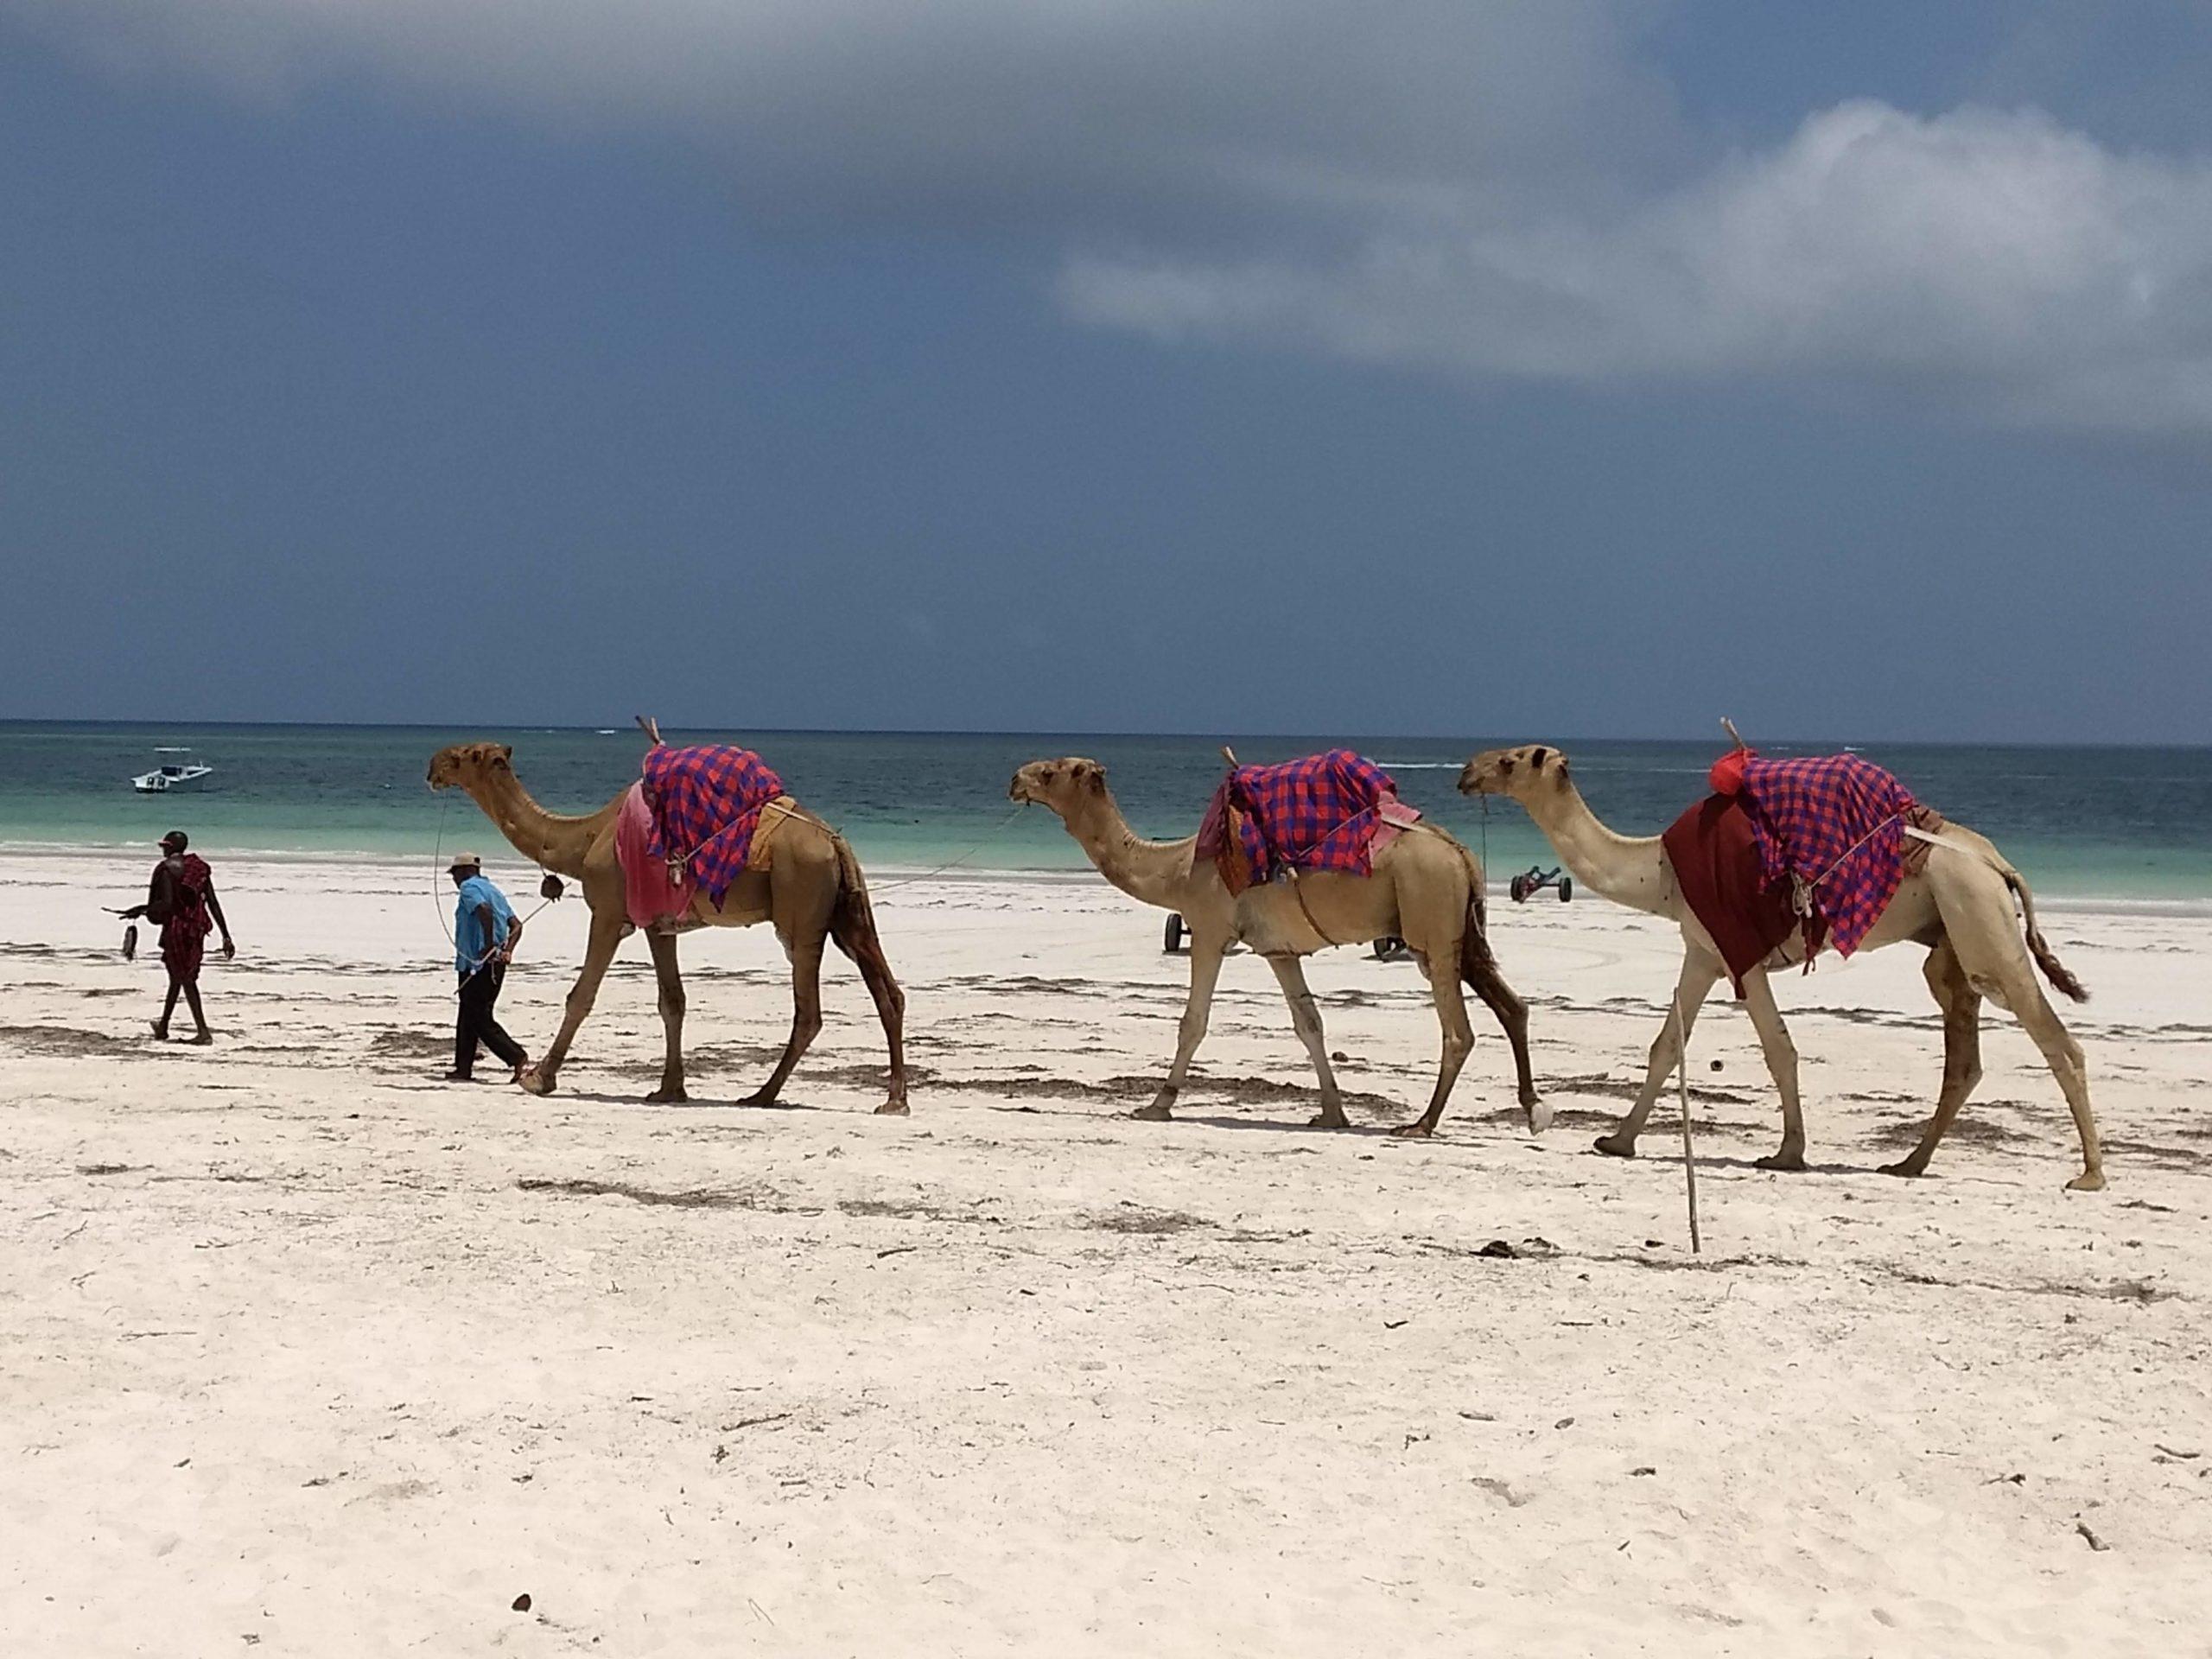 Diani Beach - Camel ride